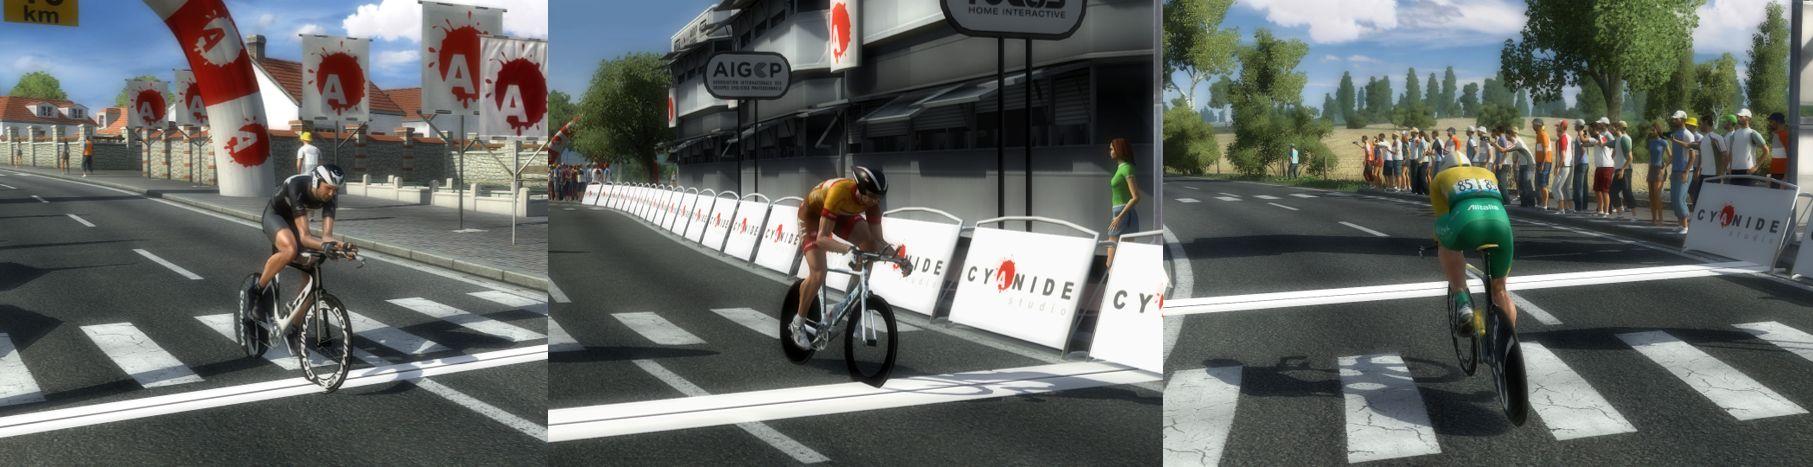 pcmdaily.com/images/mg/2019/Races/C1/Bayern/S4/mg19_bay_s04_06.jpg